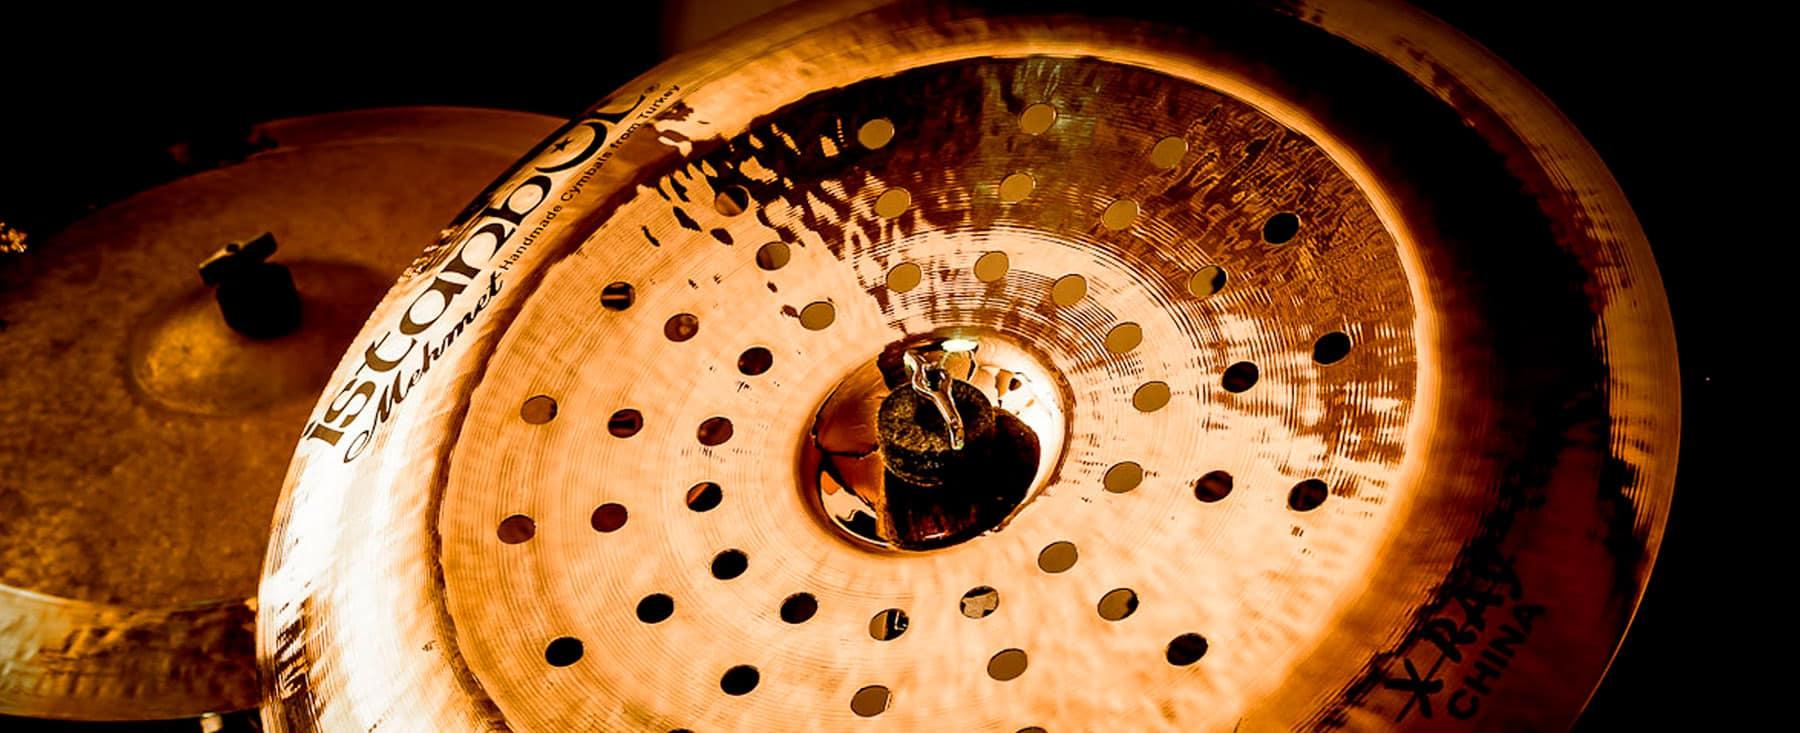 Istanbul Mehmet Cymbals - Creativedog Agency